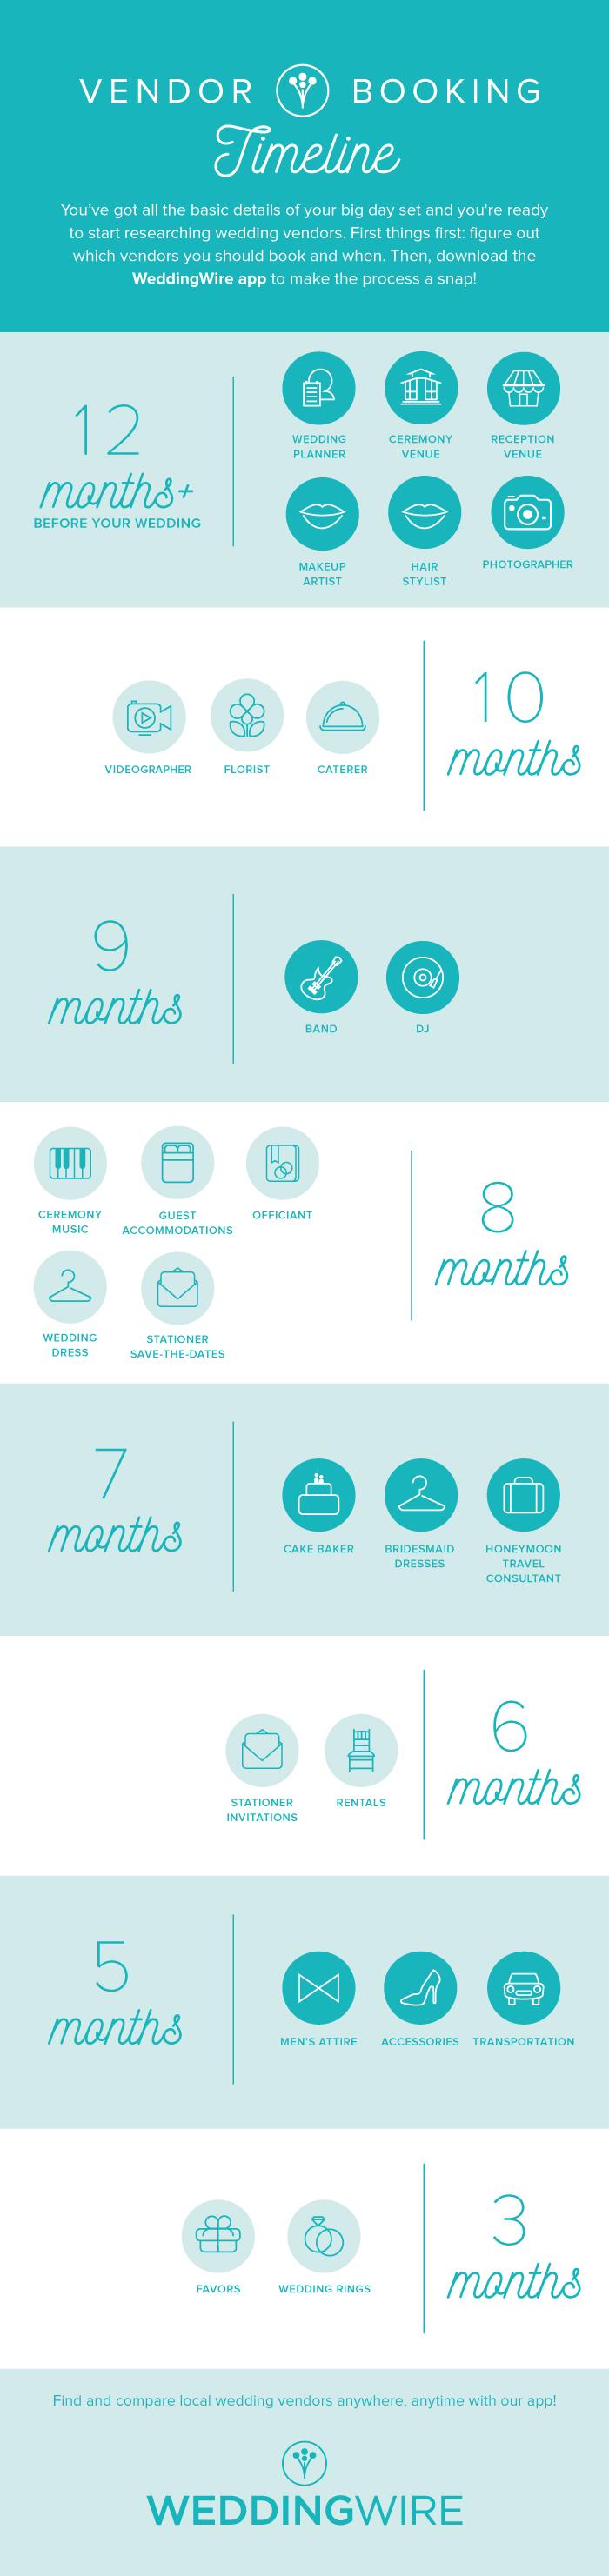 WeddingWire Vendor Booking Timeline